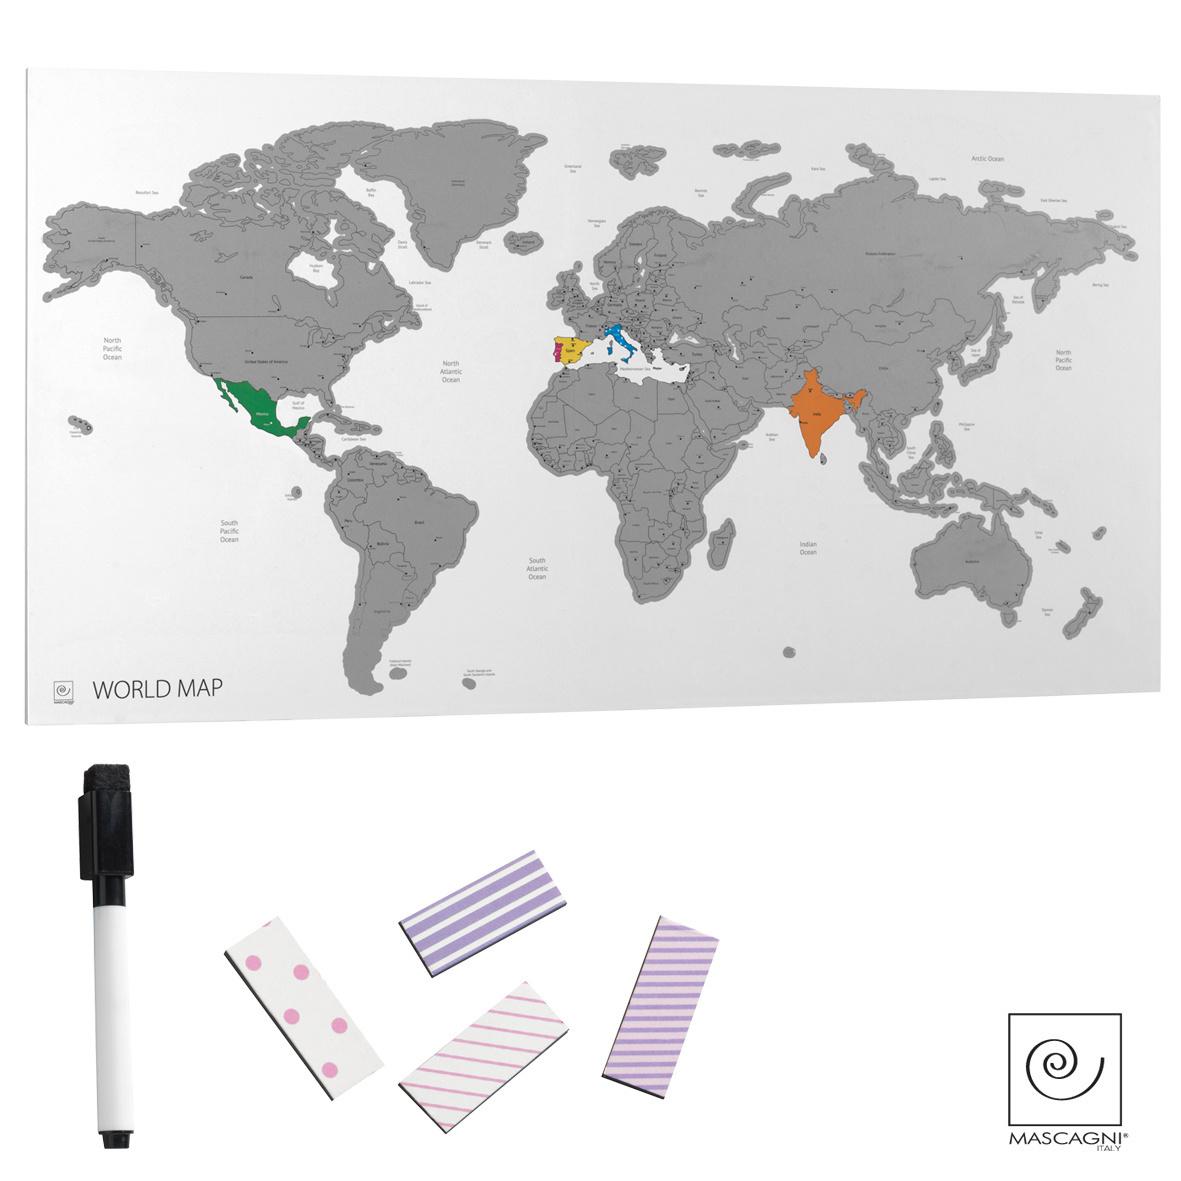 Art Mascagni MAP2 PLANISPHERE 70X37